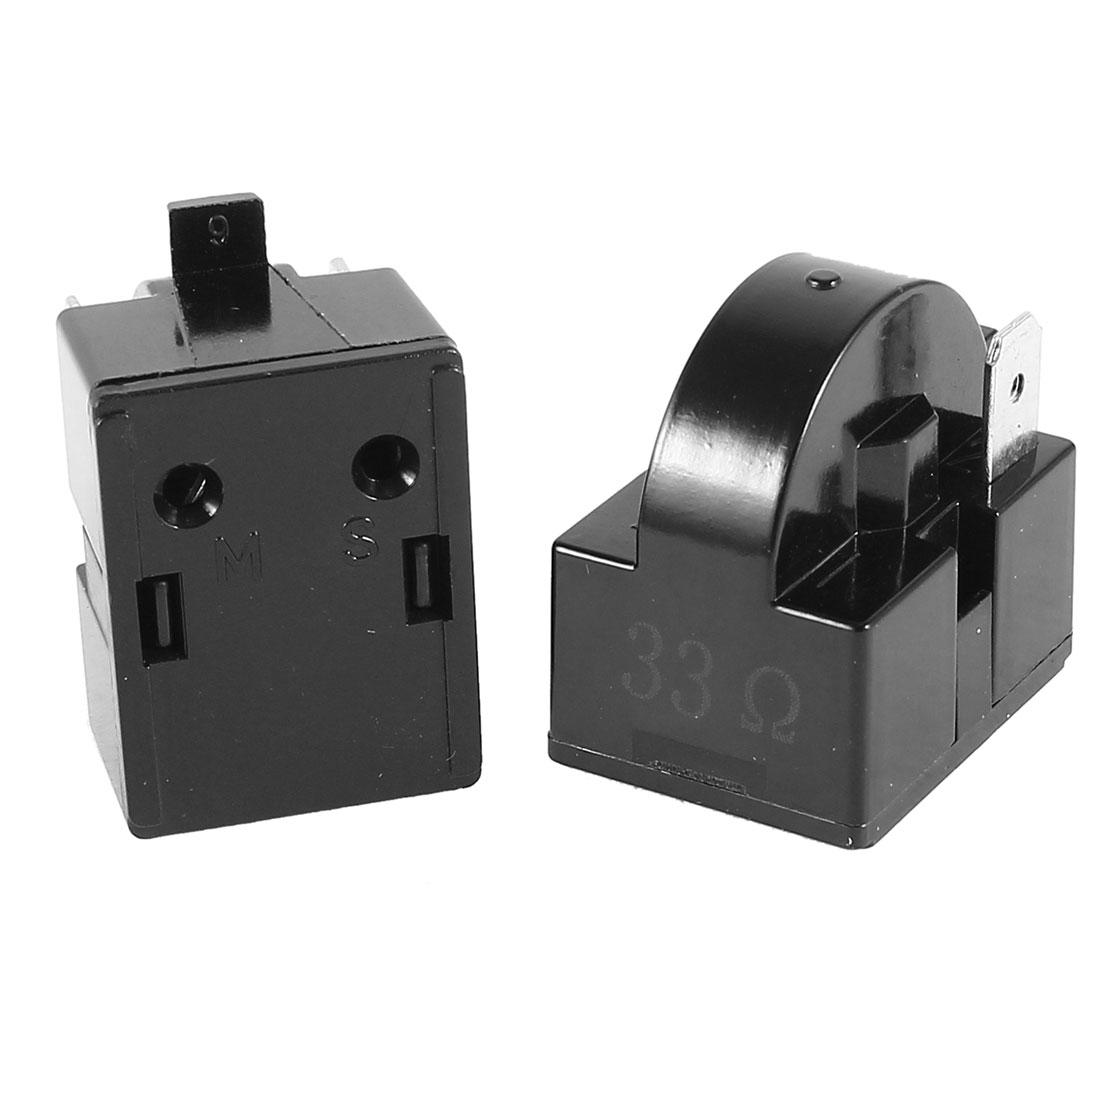 2 Pcs Black Plastic Housing 33 Ohm PTC Starter Relay for Refrigerator